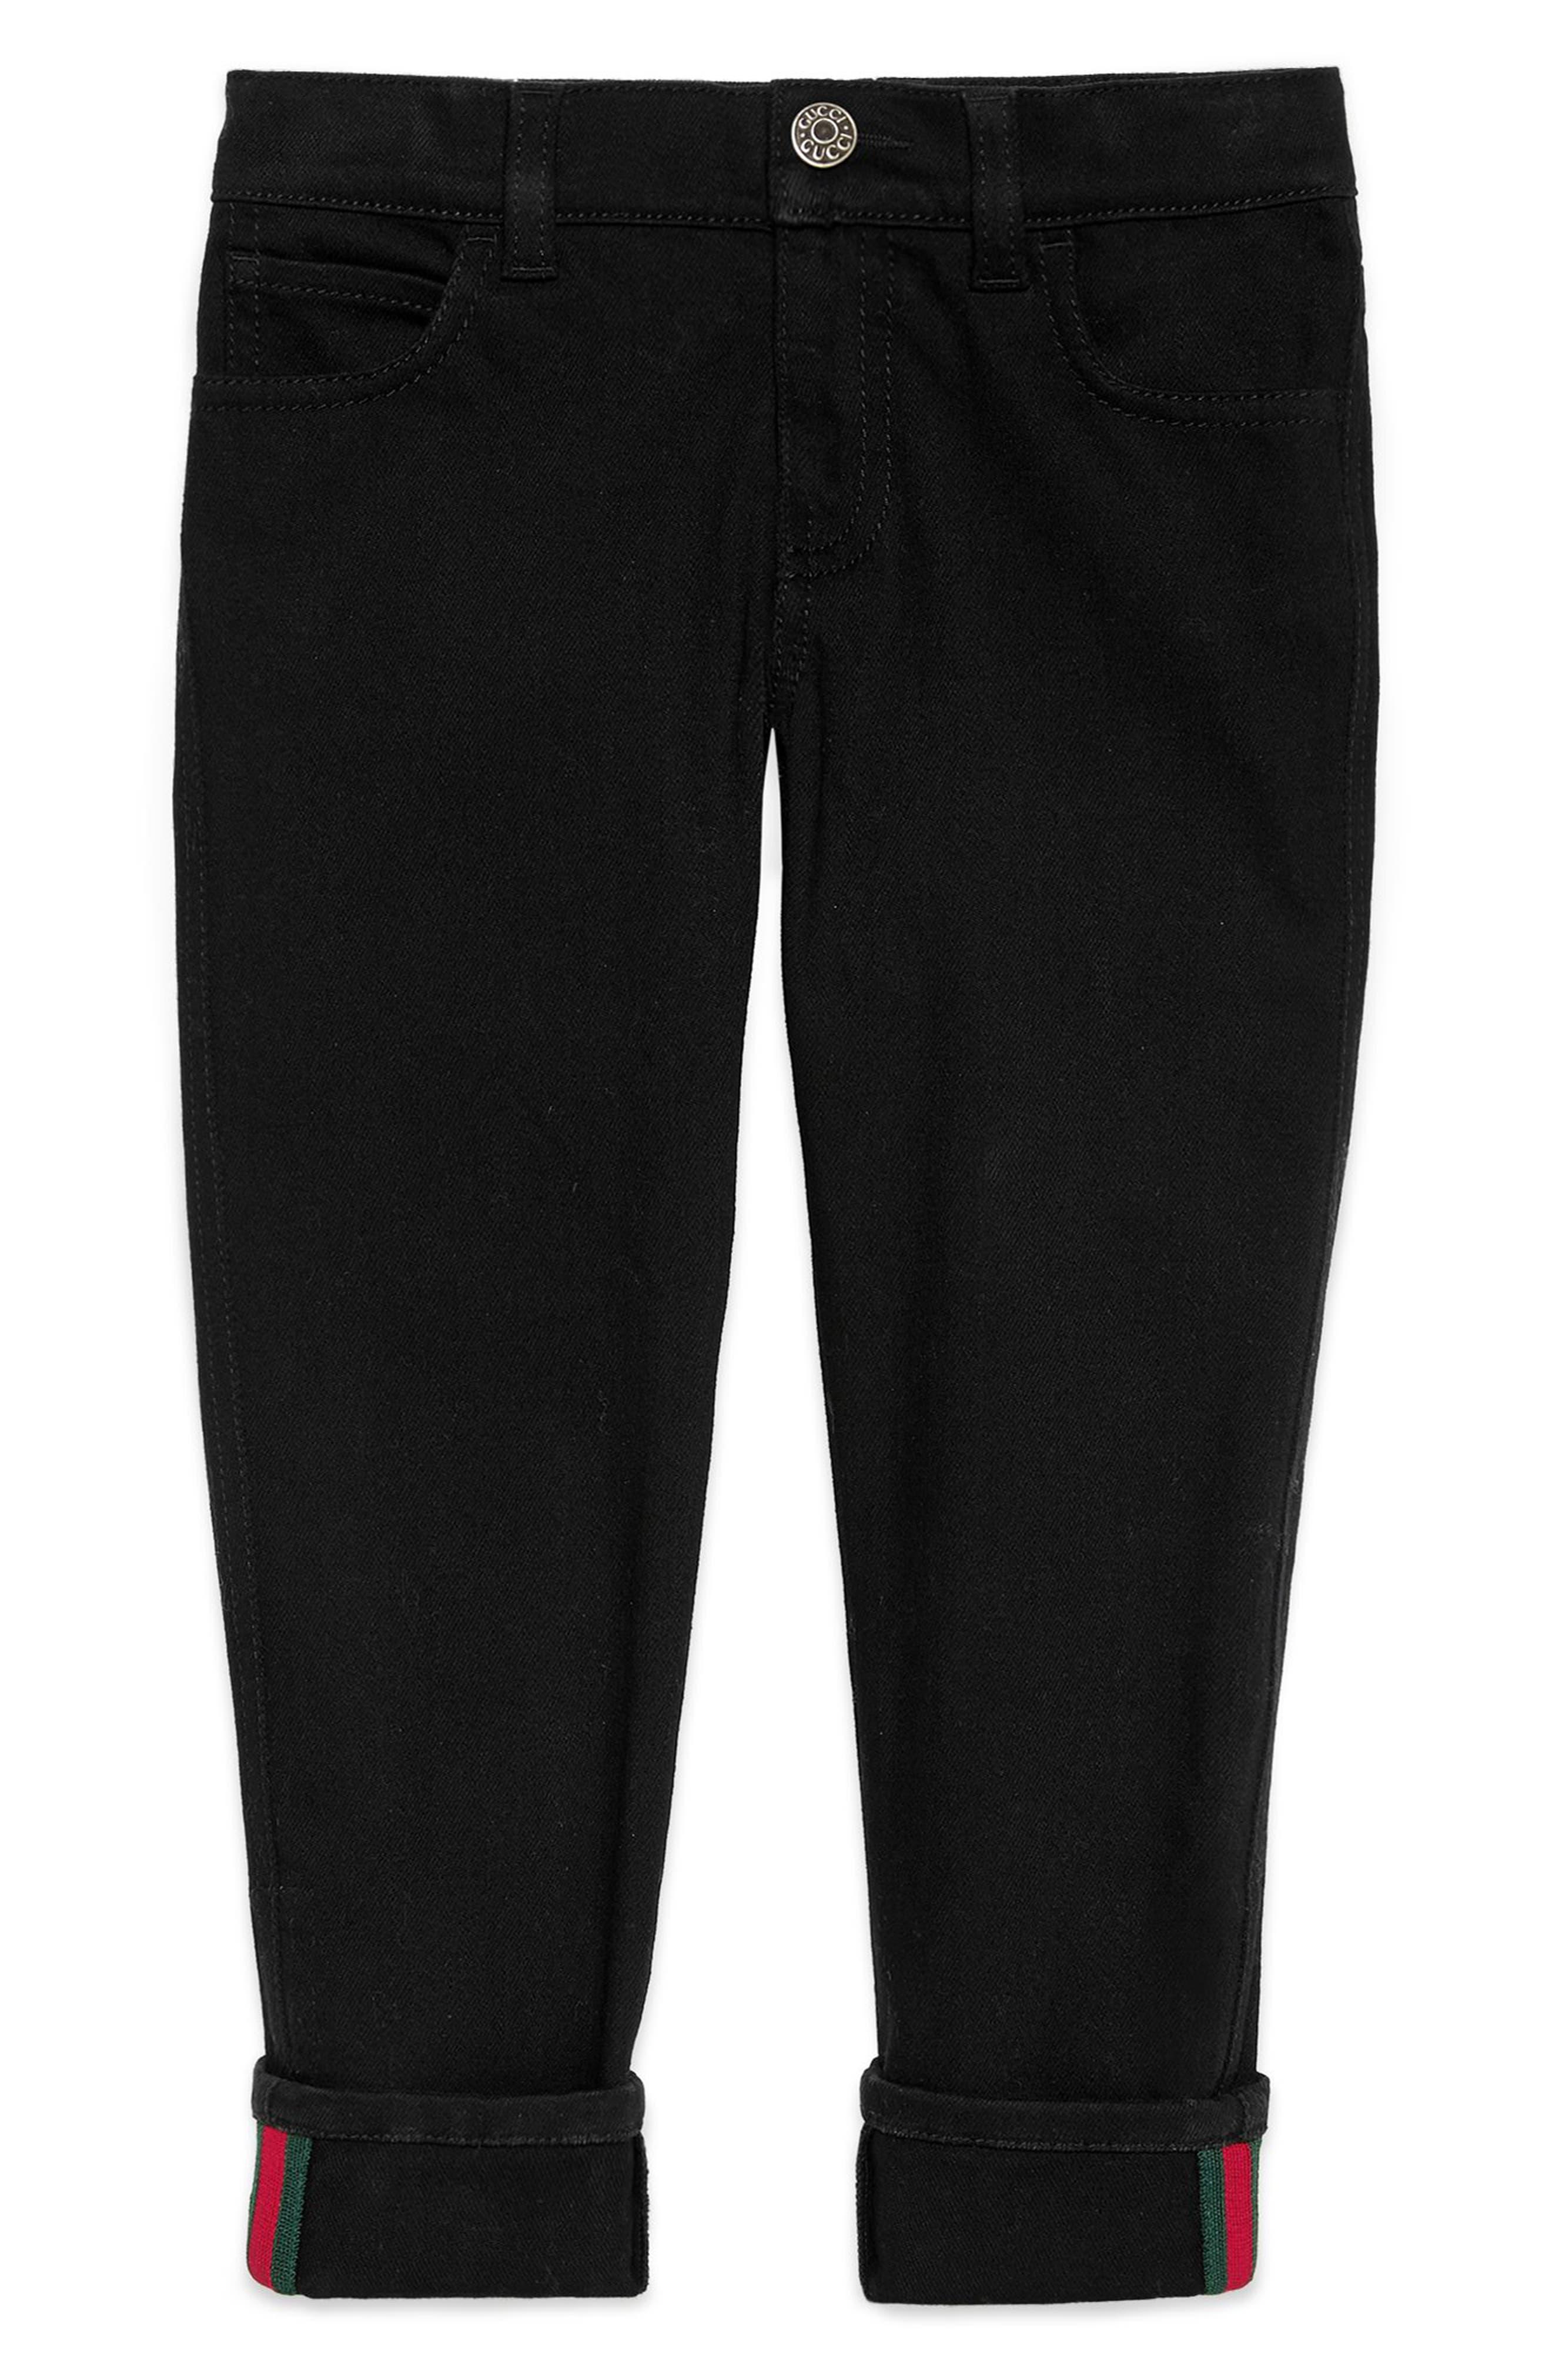 Straight Leg Pants,                         Main,                         color, BLACK/ GREEN/ RED